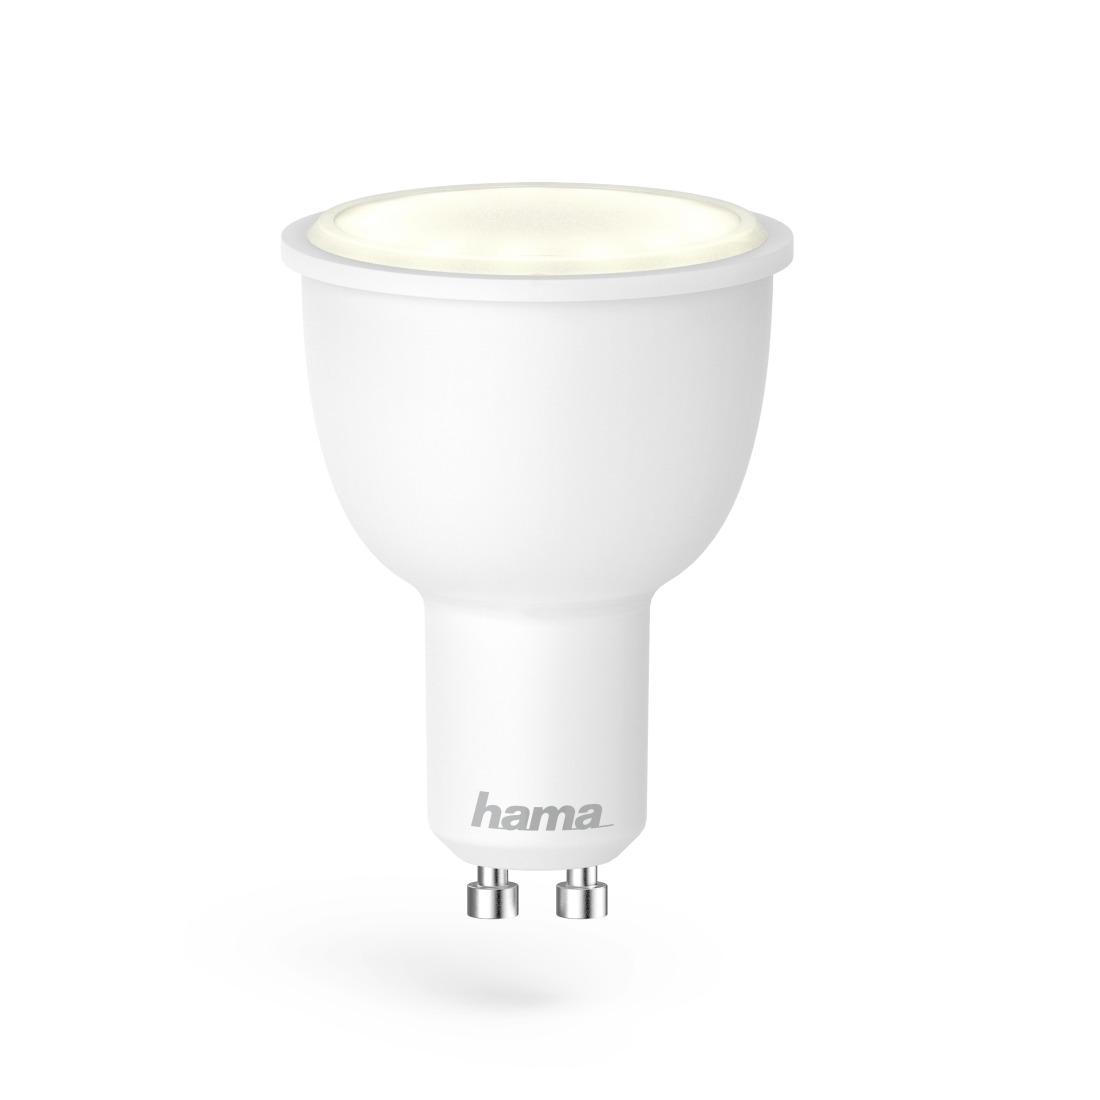 Hama Wifi-ledlamp, GU10, 4.5W, , dimbaar Smartverlichting Wit